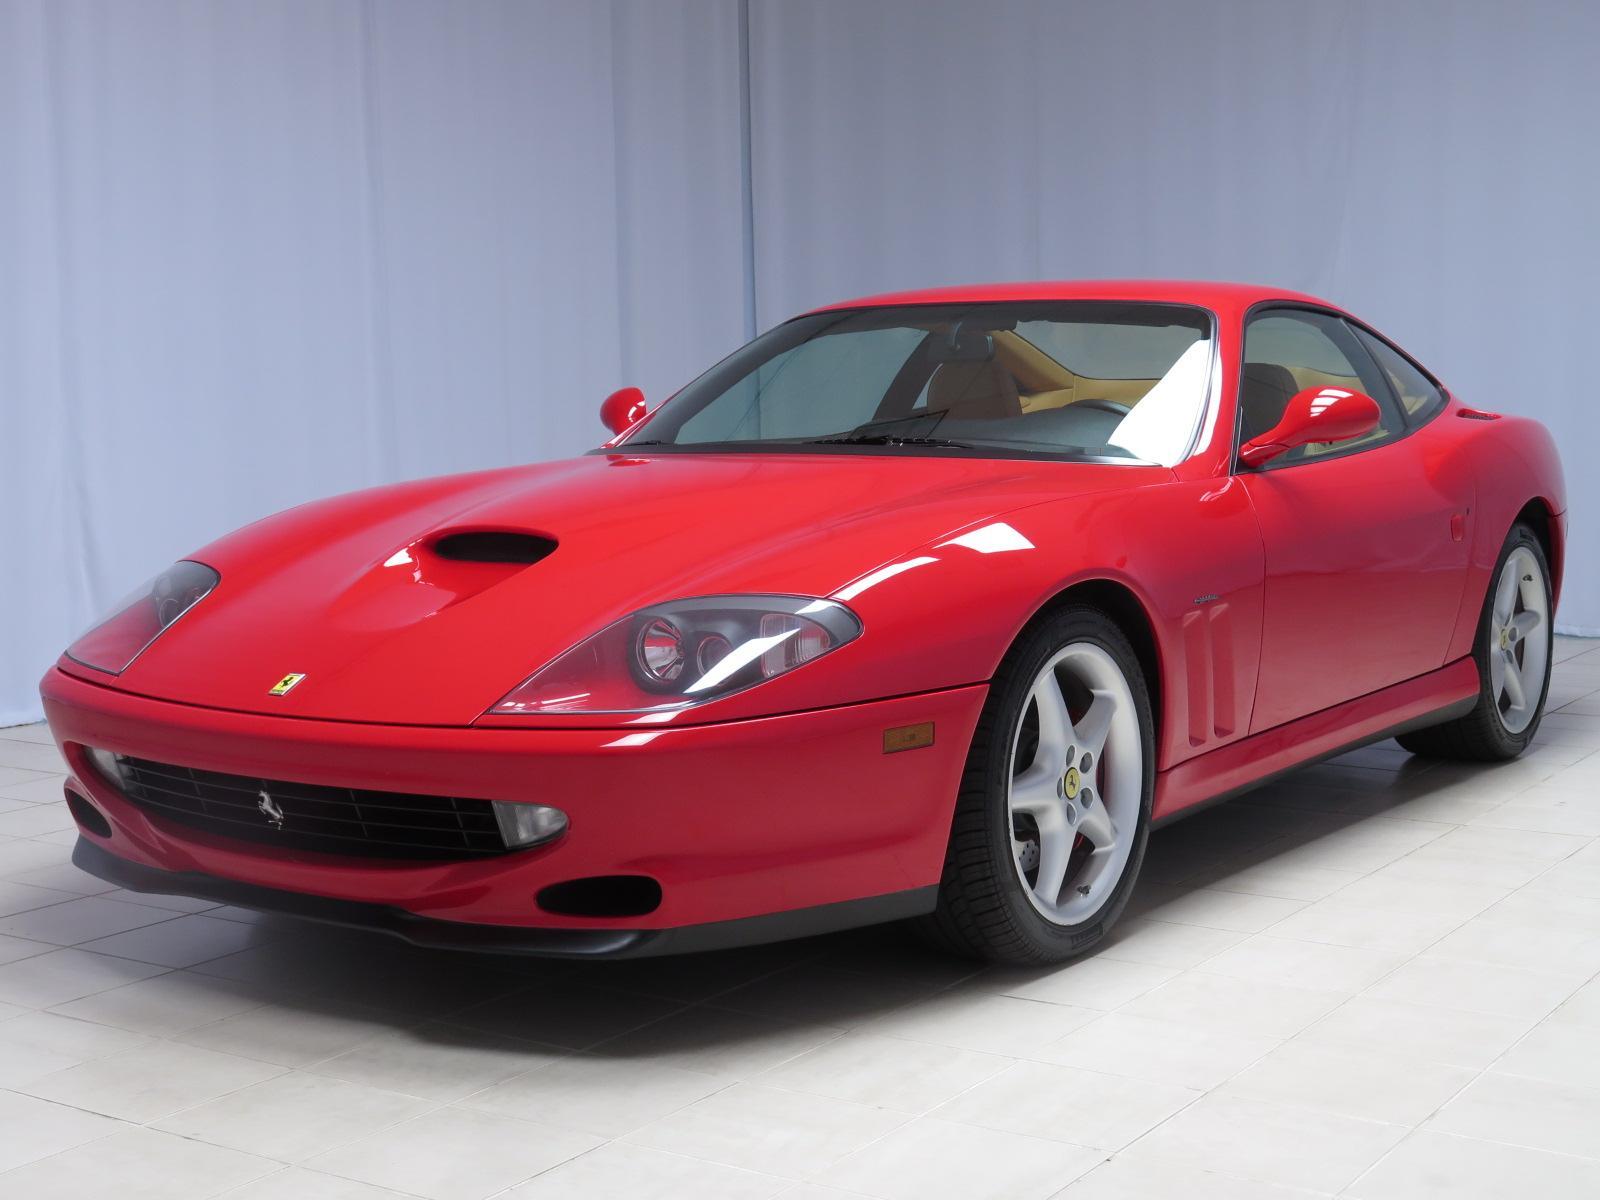 У бизнесмена отобрали Ferrari за долг по алиментам